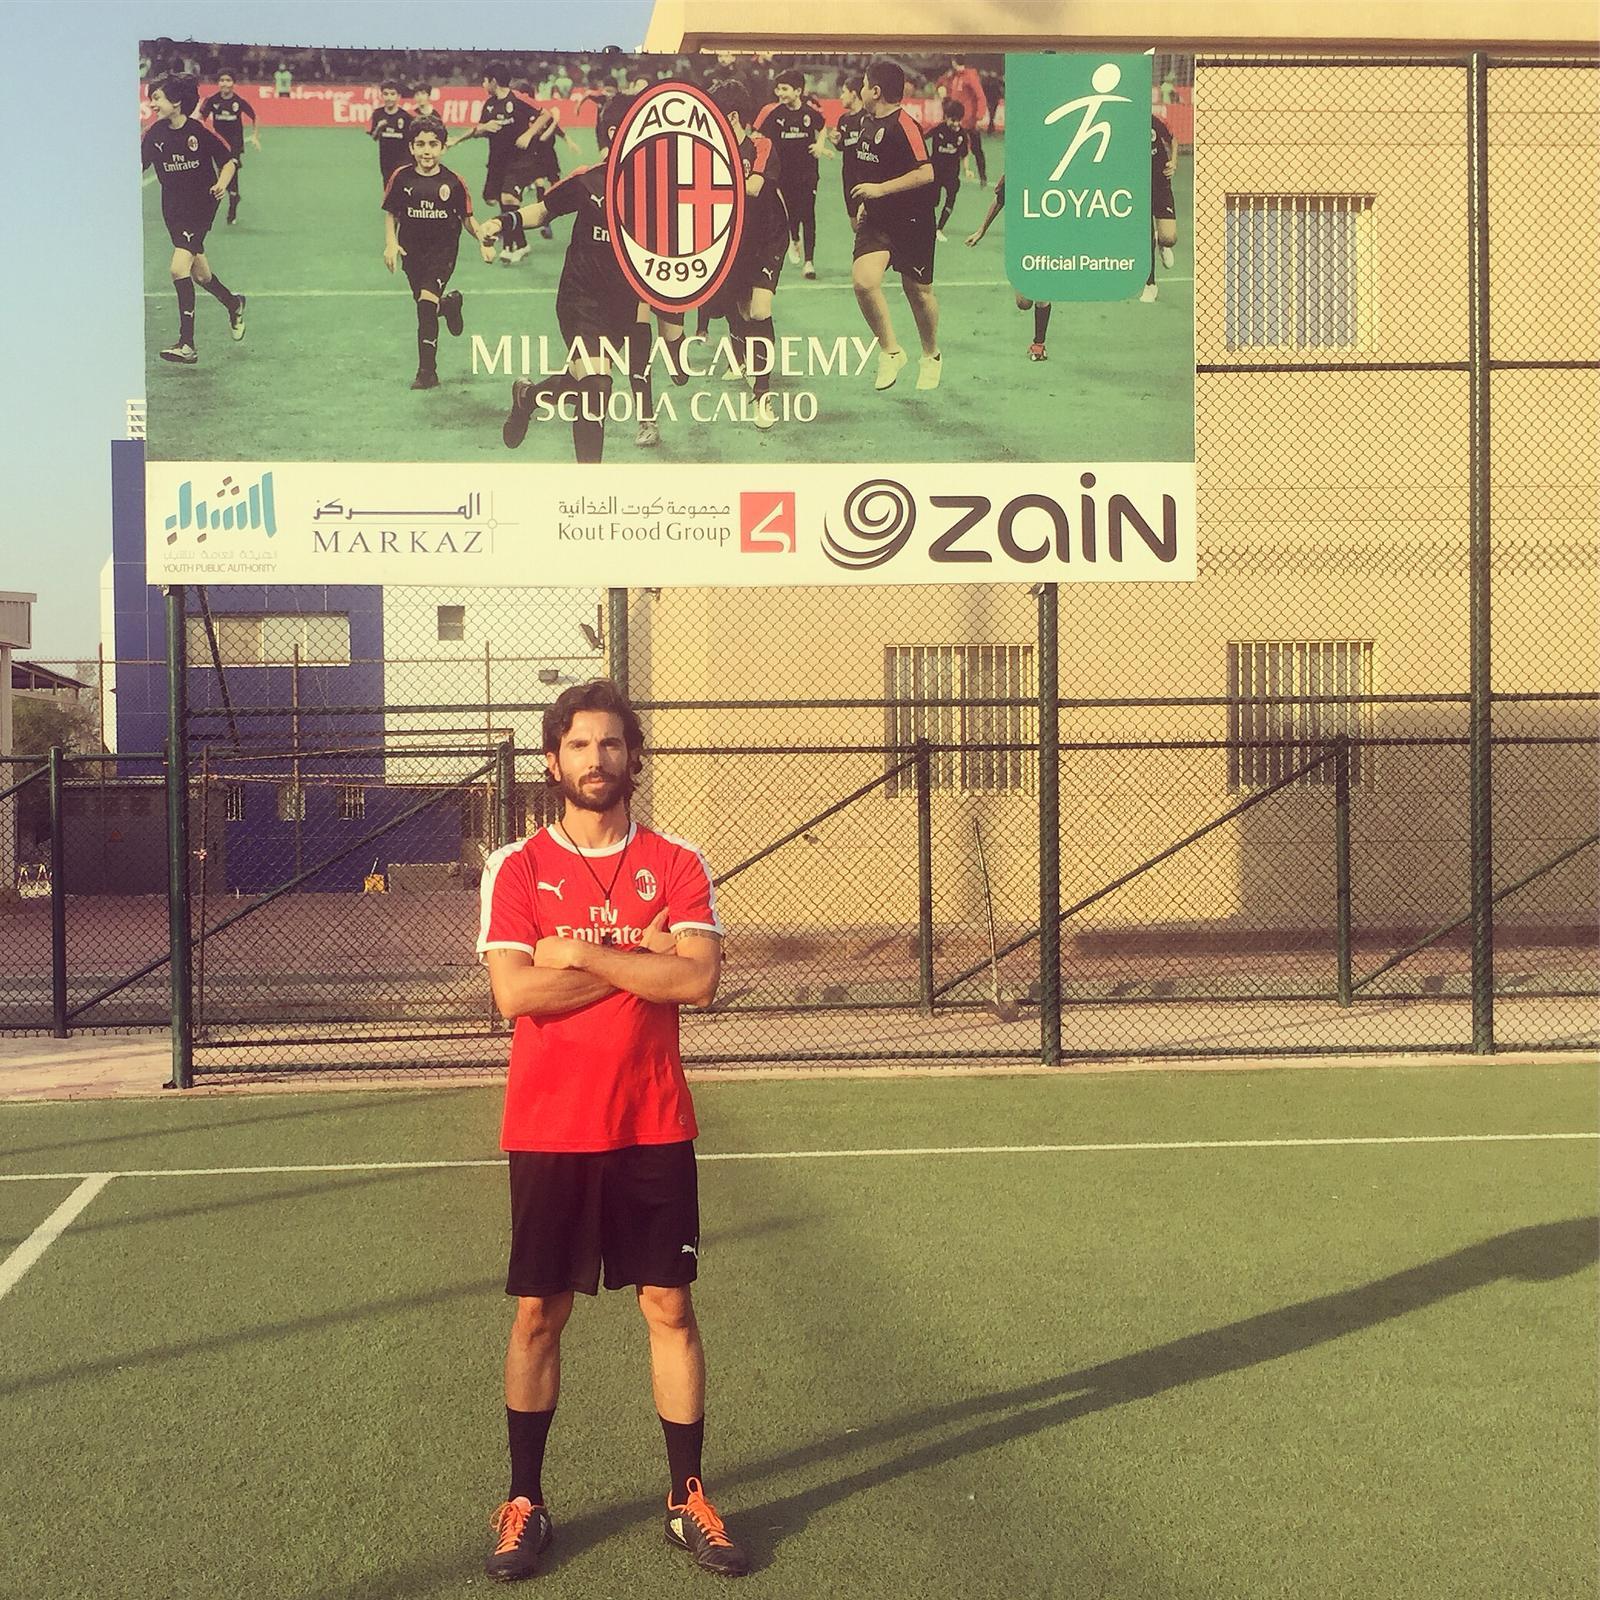 Da Ravenna ad allenatore in Kuwait per la Milan Academy